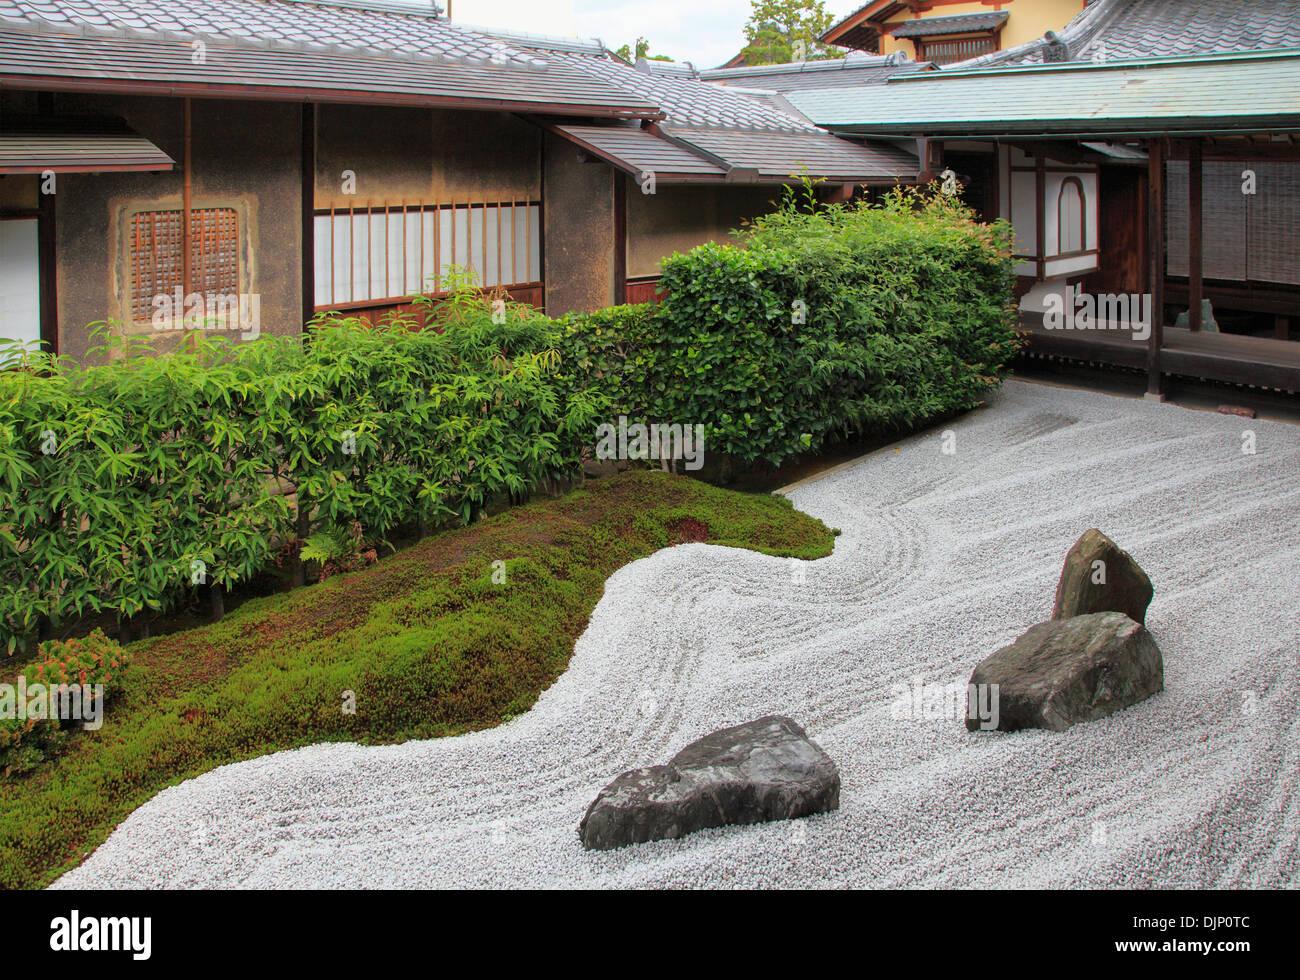 Japan, Kyoto, Daitokuji Temple, Zuiho-in, Garden of the Cross, - Stock Image